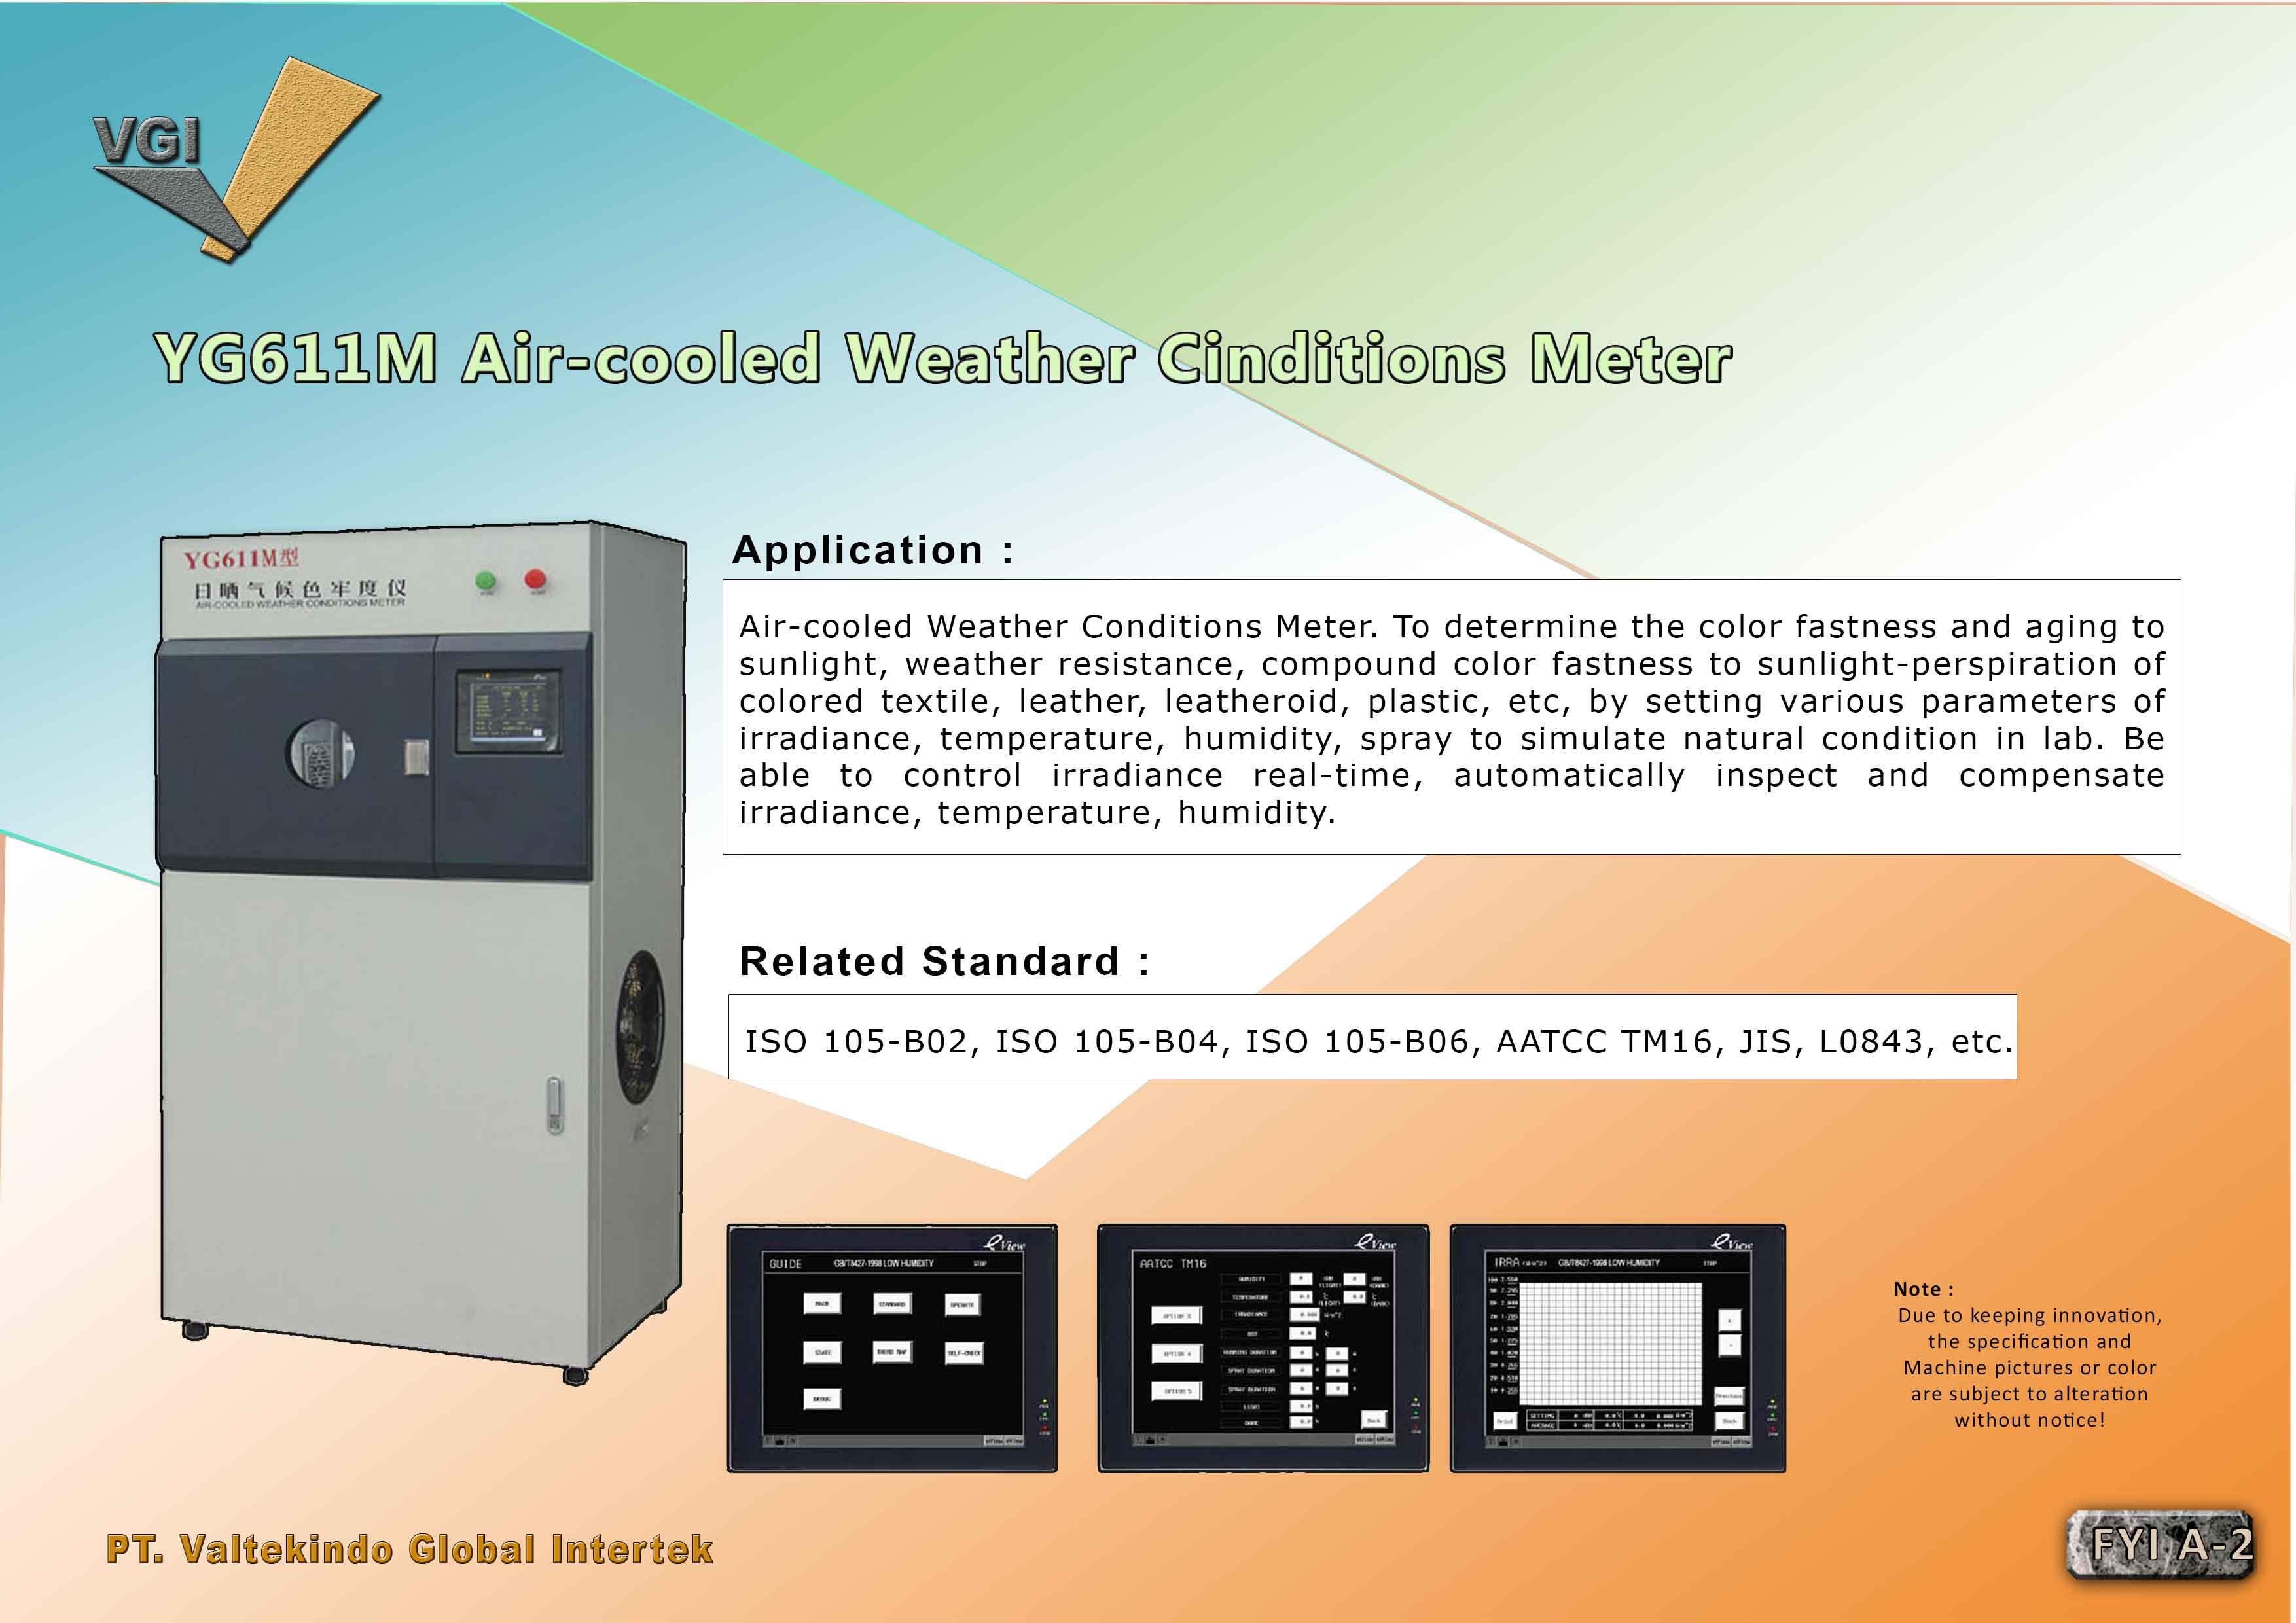 jual mesin Air Cooled Weather Cinditions Meter Air Cooled Weather Cinditions Meter